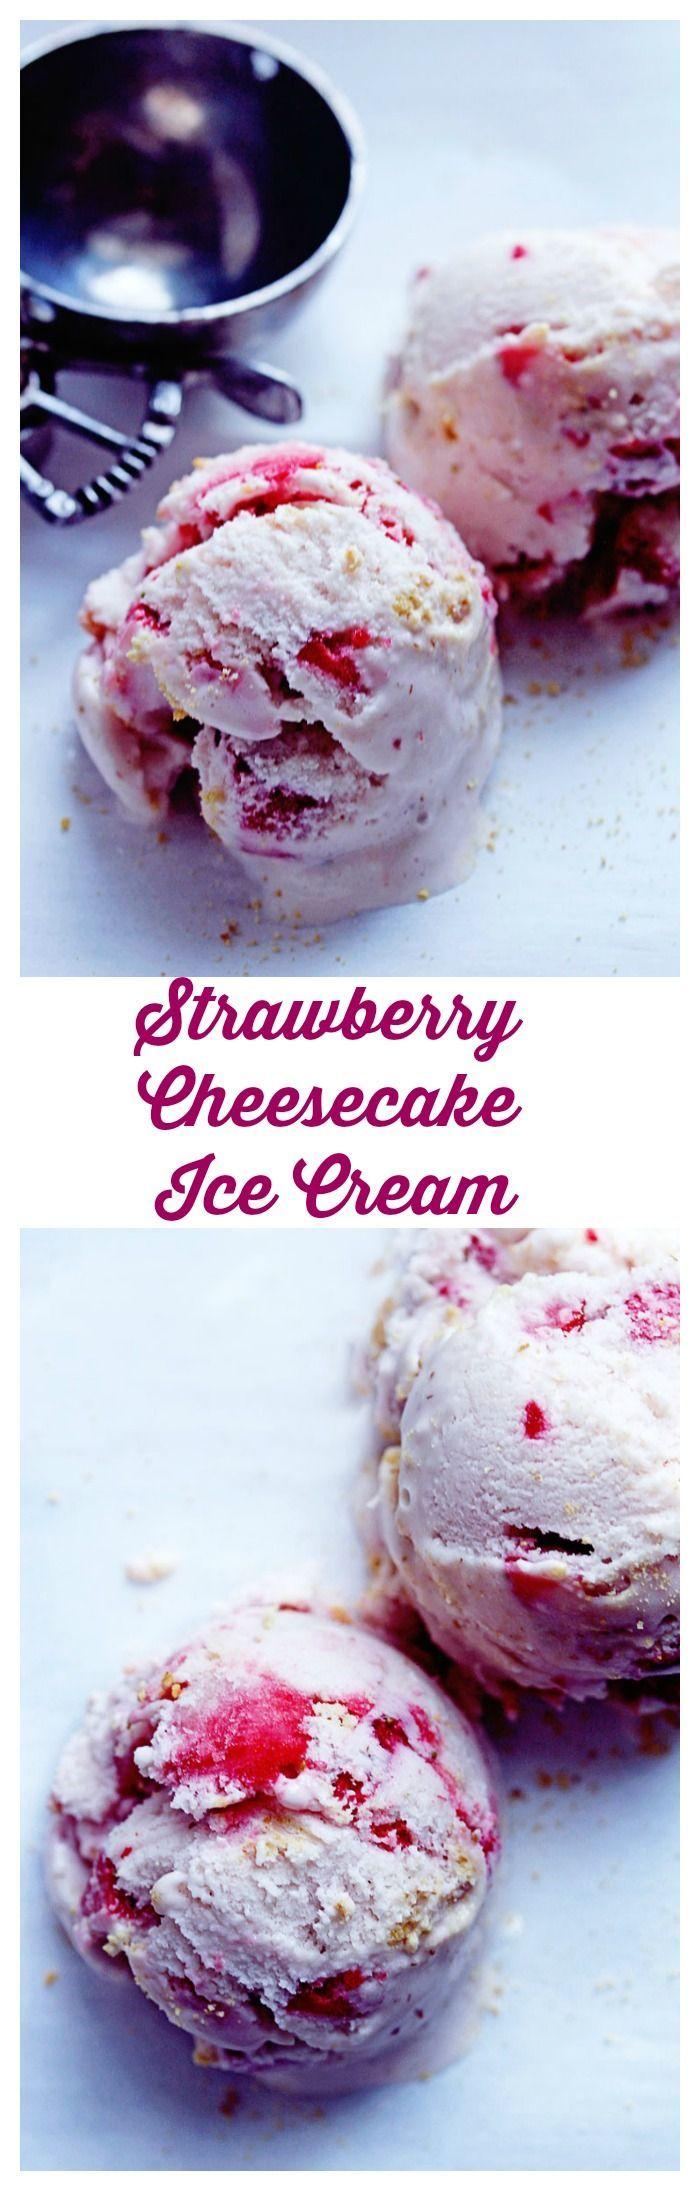 strawberry cheesecake ice cream grandbaby cakes ice cream recipes strawberry cheesecake ice on hebbar s kitchen recipes videos ice cream id=17324